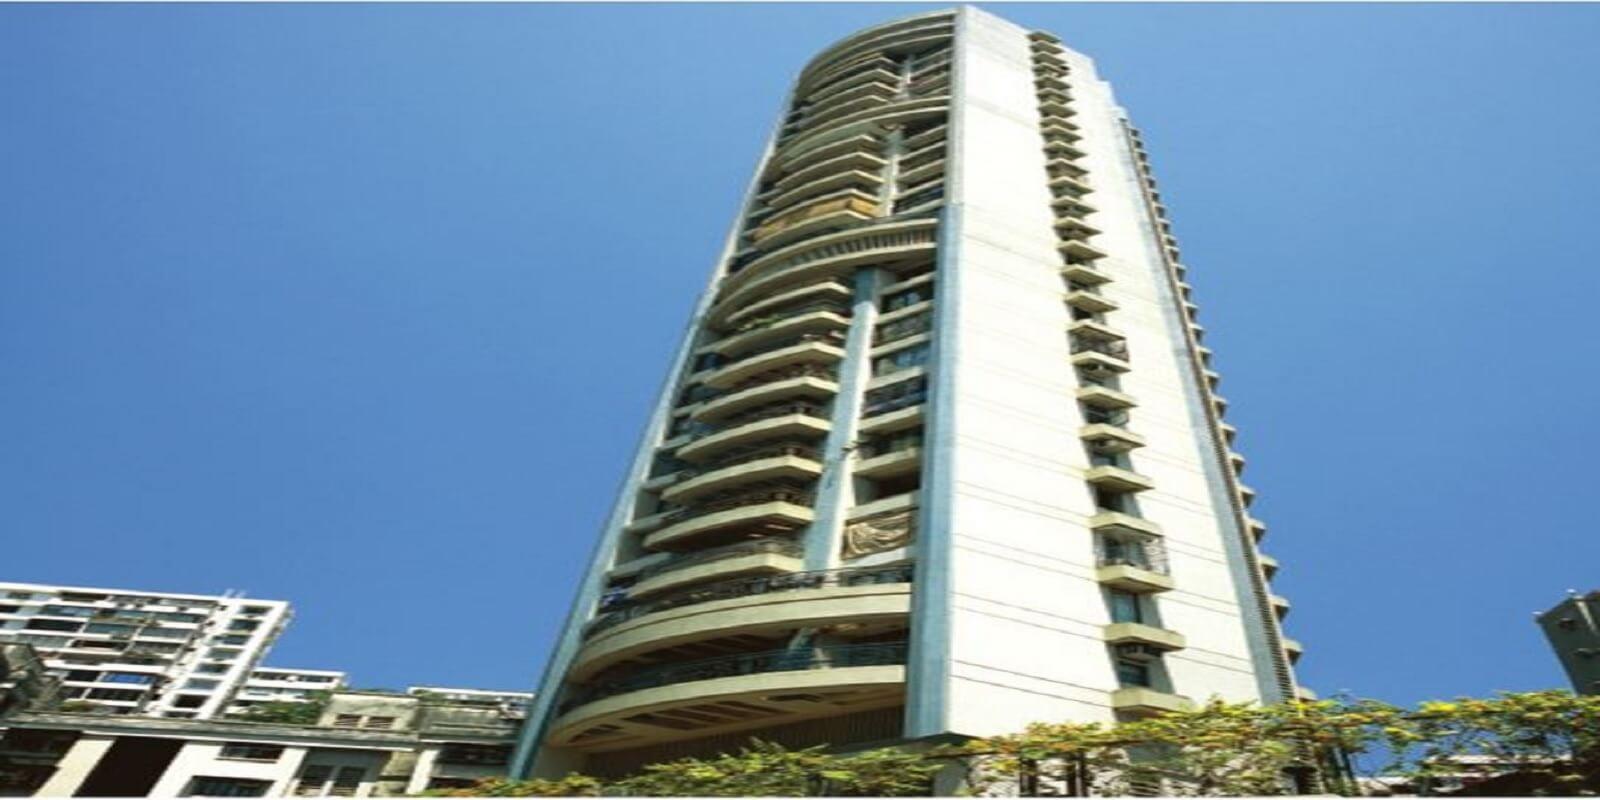 shapoorji pallonji sterling tower project project large image1